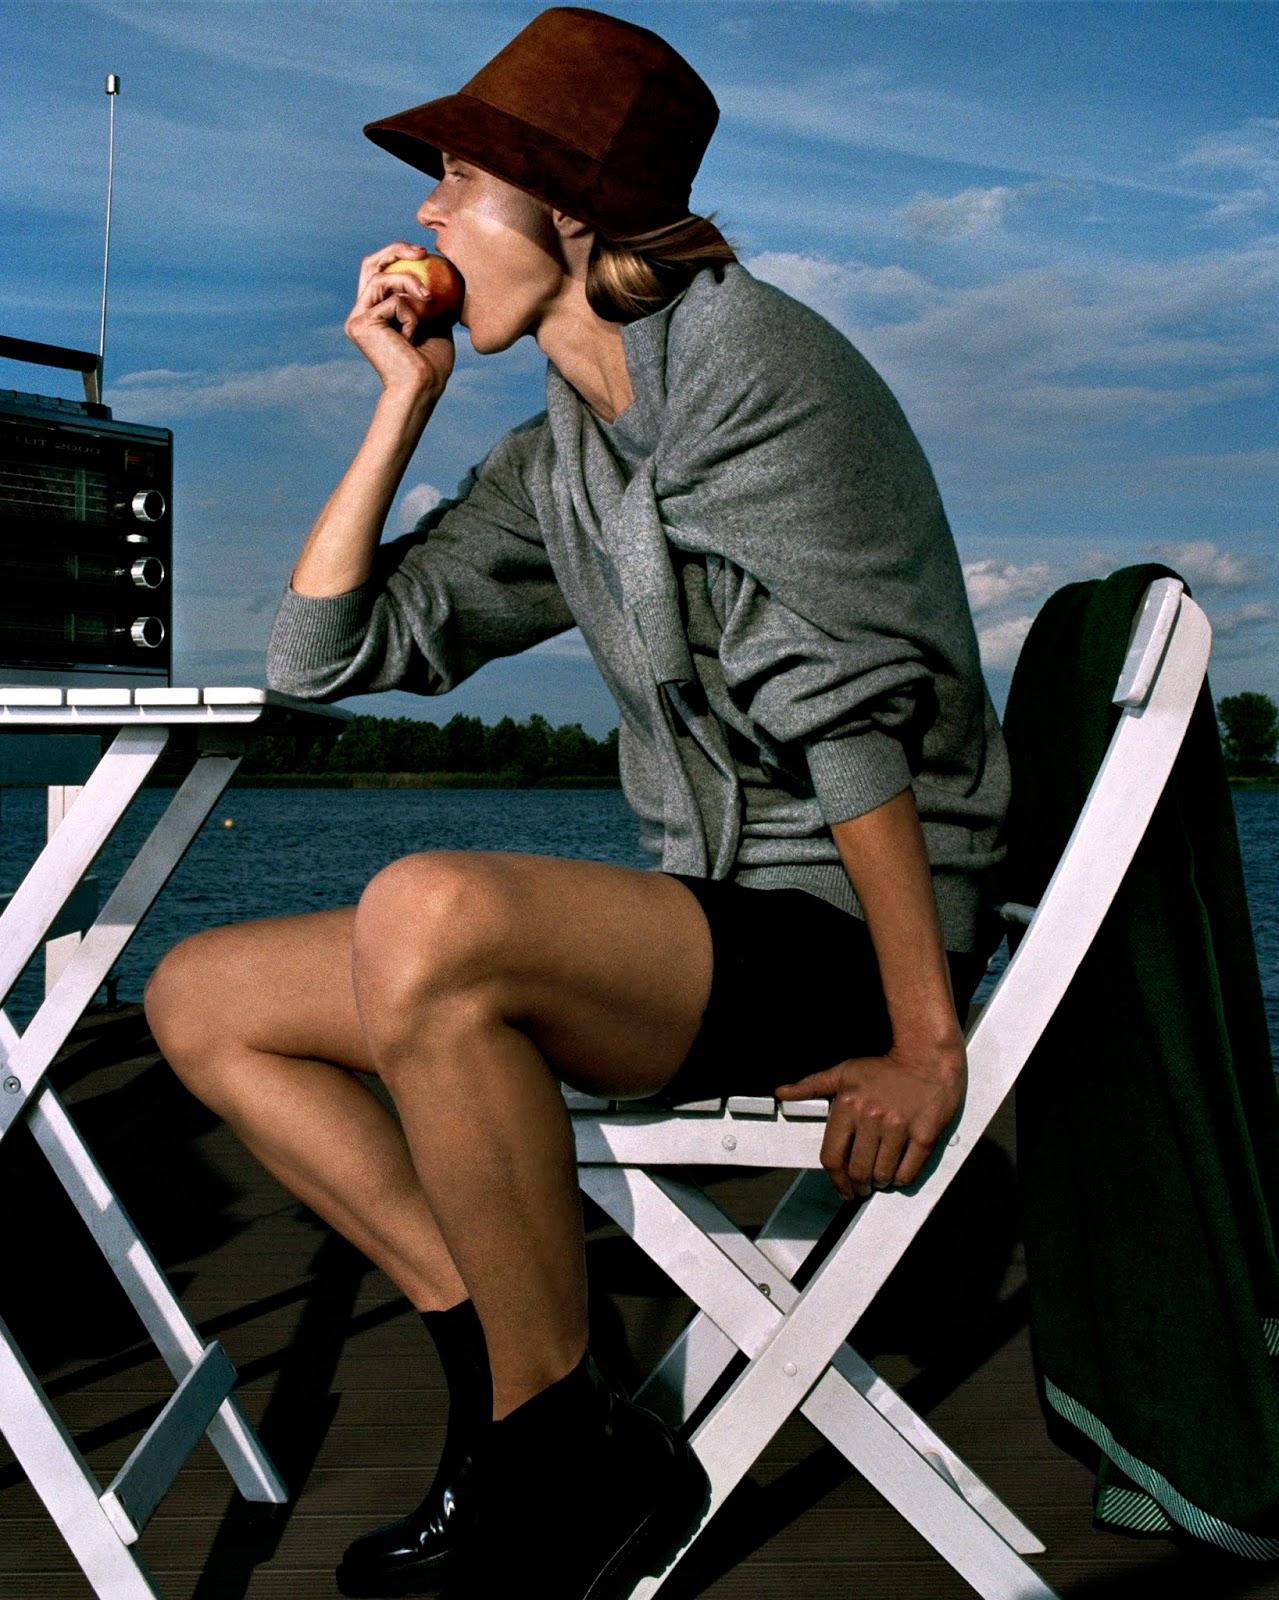 Sweater Alexander Wang; shorts Nagnata; boots Prada; hat Albus Lumen. Malgosia Bela by Hugo Comte.